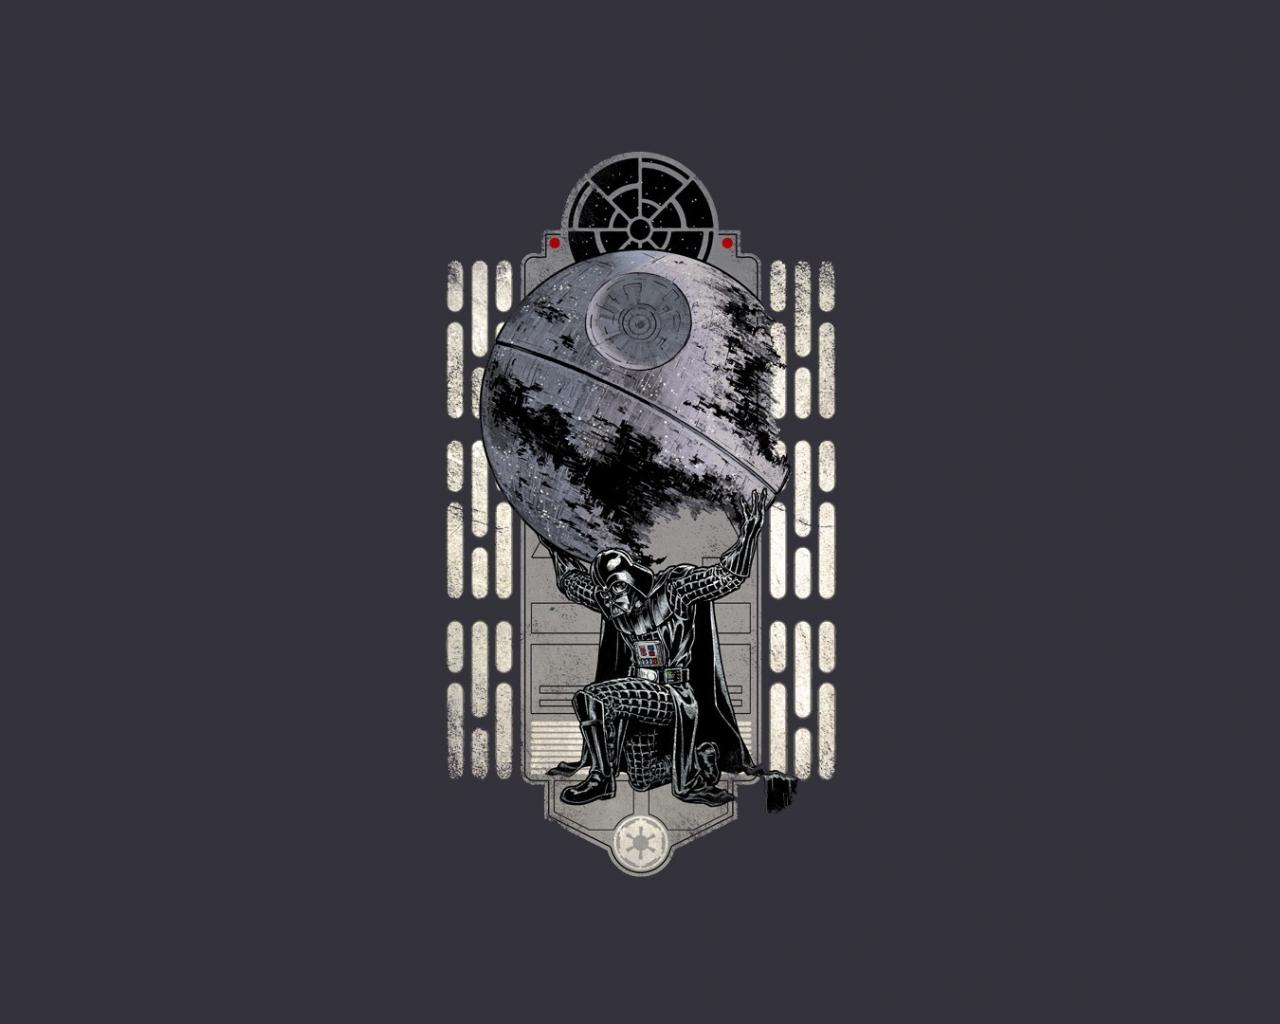 Free Download Wallpaper Star Wars Star Wars Darth Vader Darth Vader Death Star 1920x1080 For Your Desktop Mobile Tablet Explore 48 Death Star Iphone Wallpaper Star Trek Iphone 6